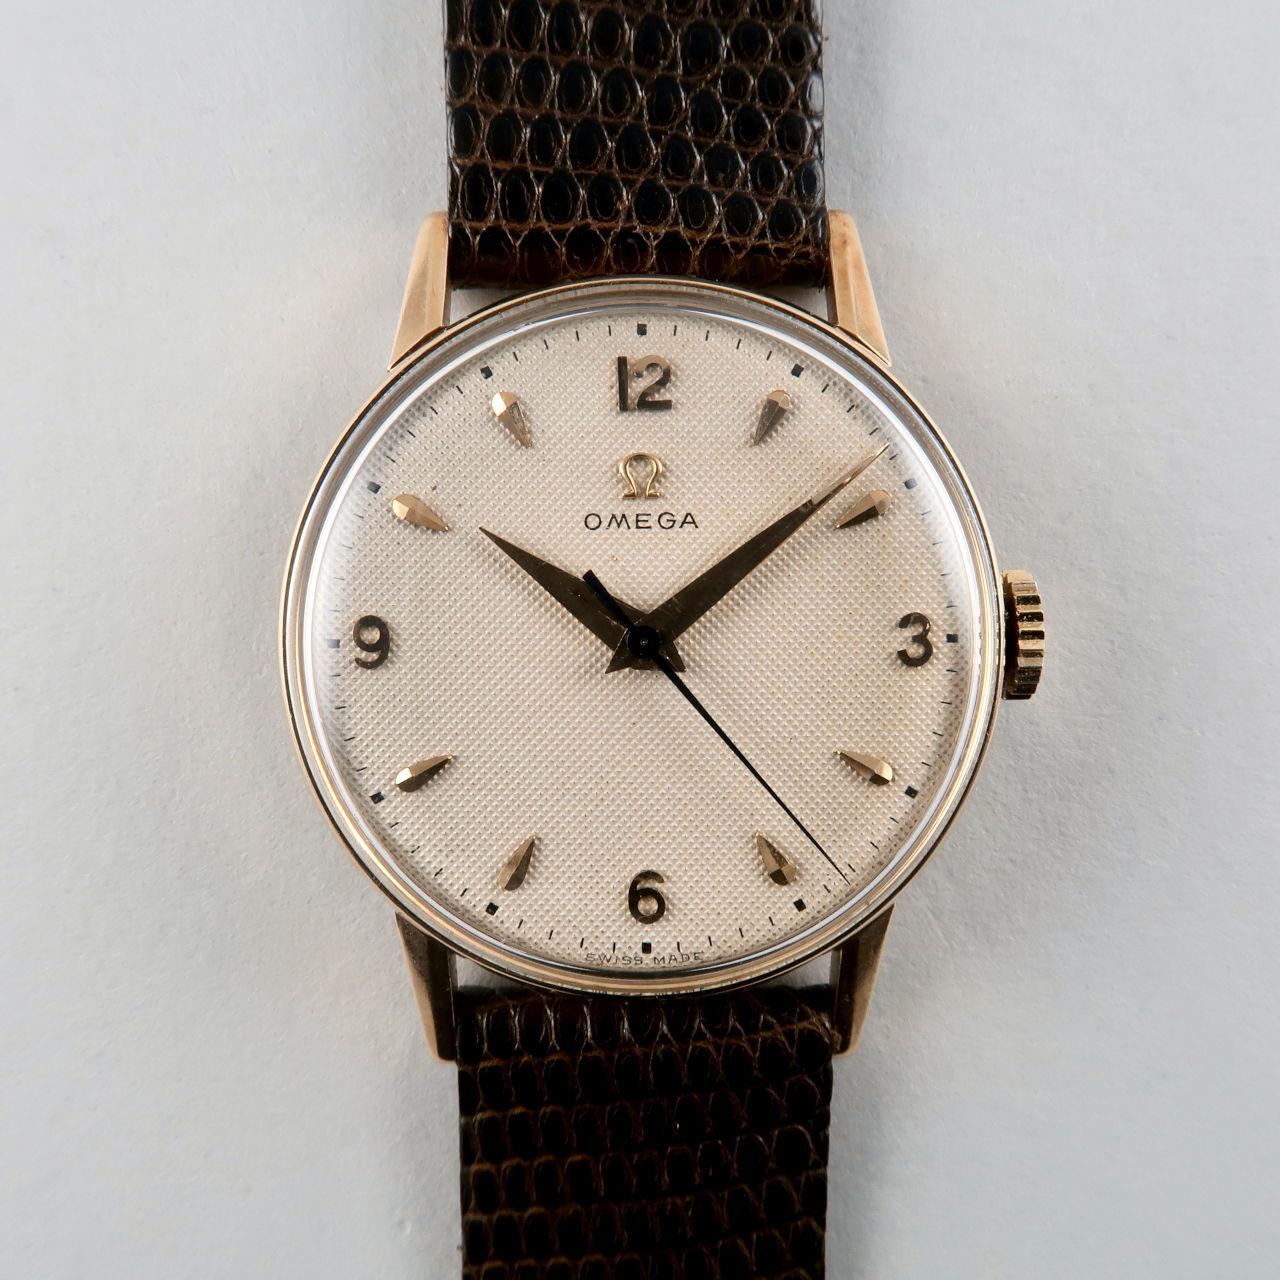 Omega Ref. 2496 circa 1950 | 14ct gold manual vintage wristwatch honeycomb dial